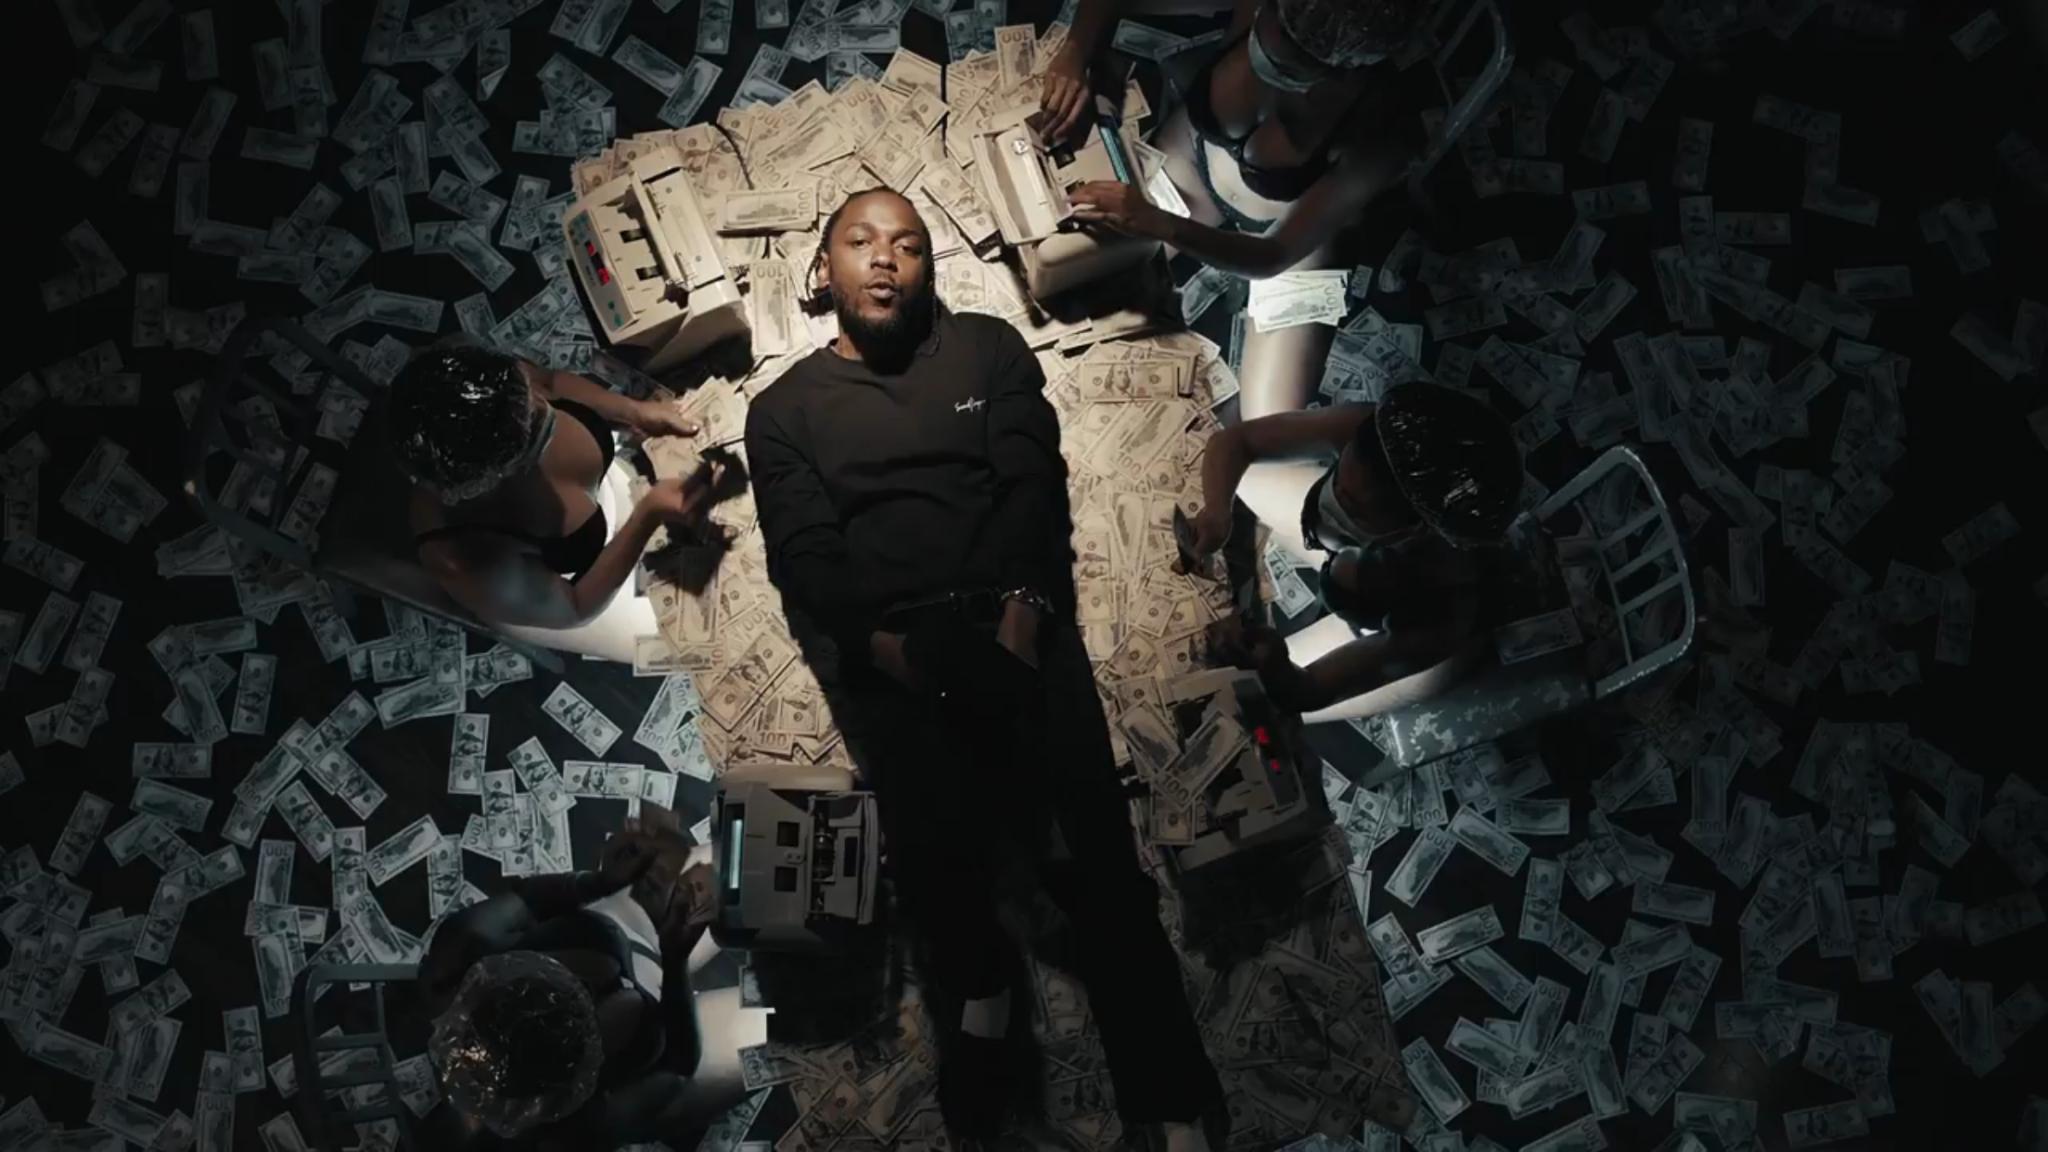 Humble, Kendrick Lamar os simbolismos do clipe YouTube